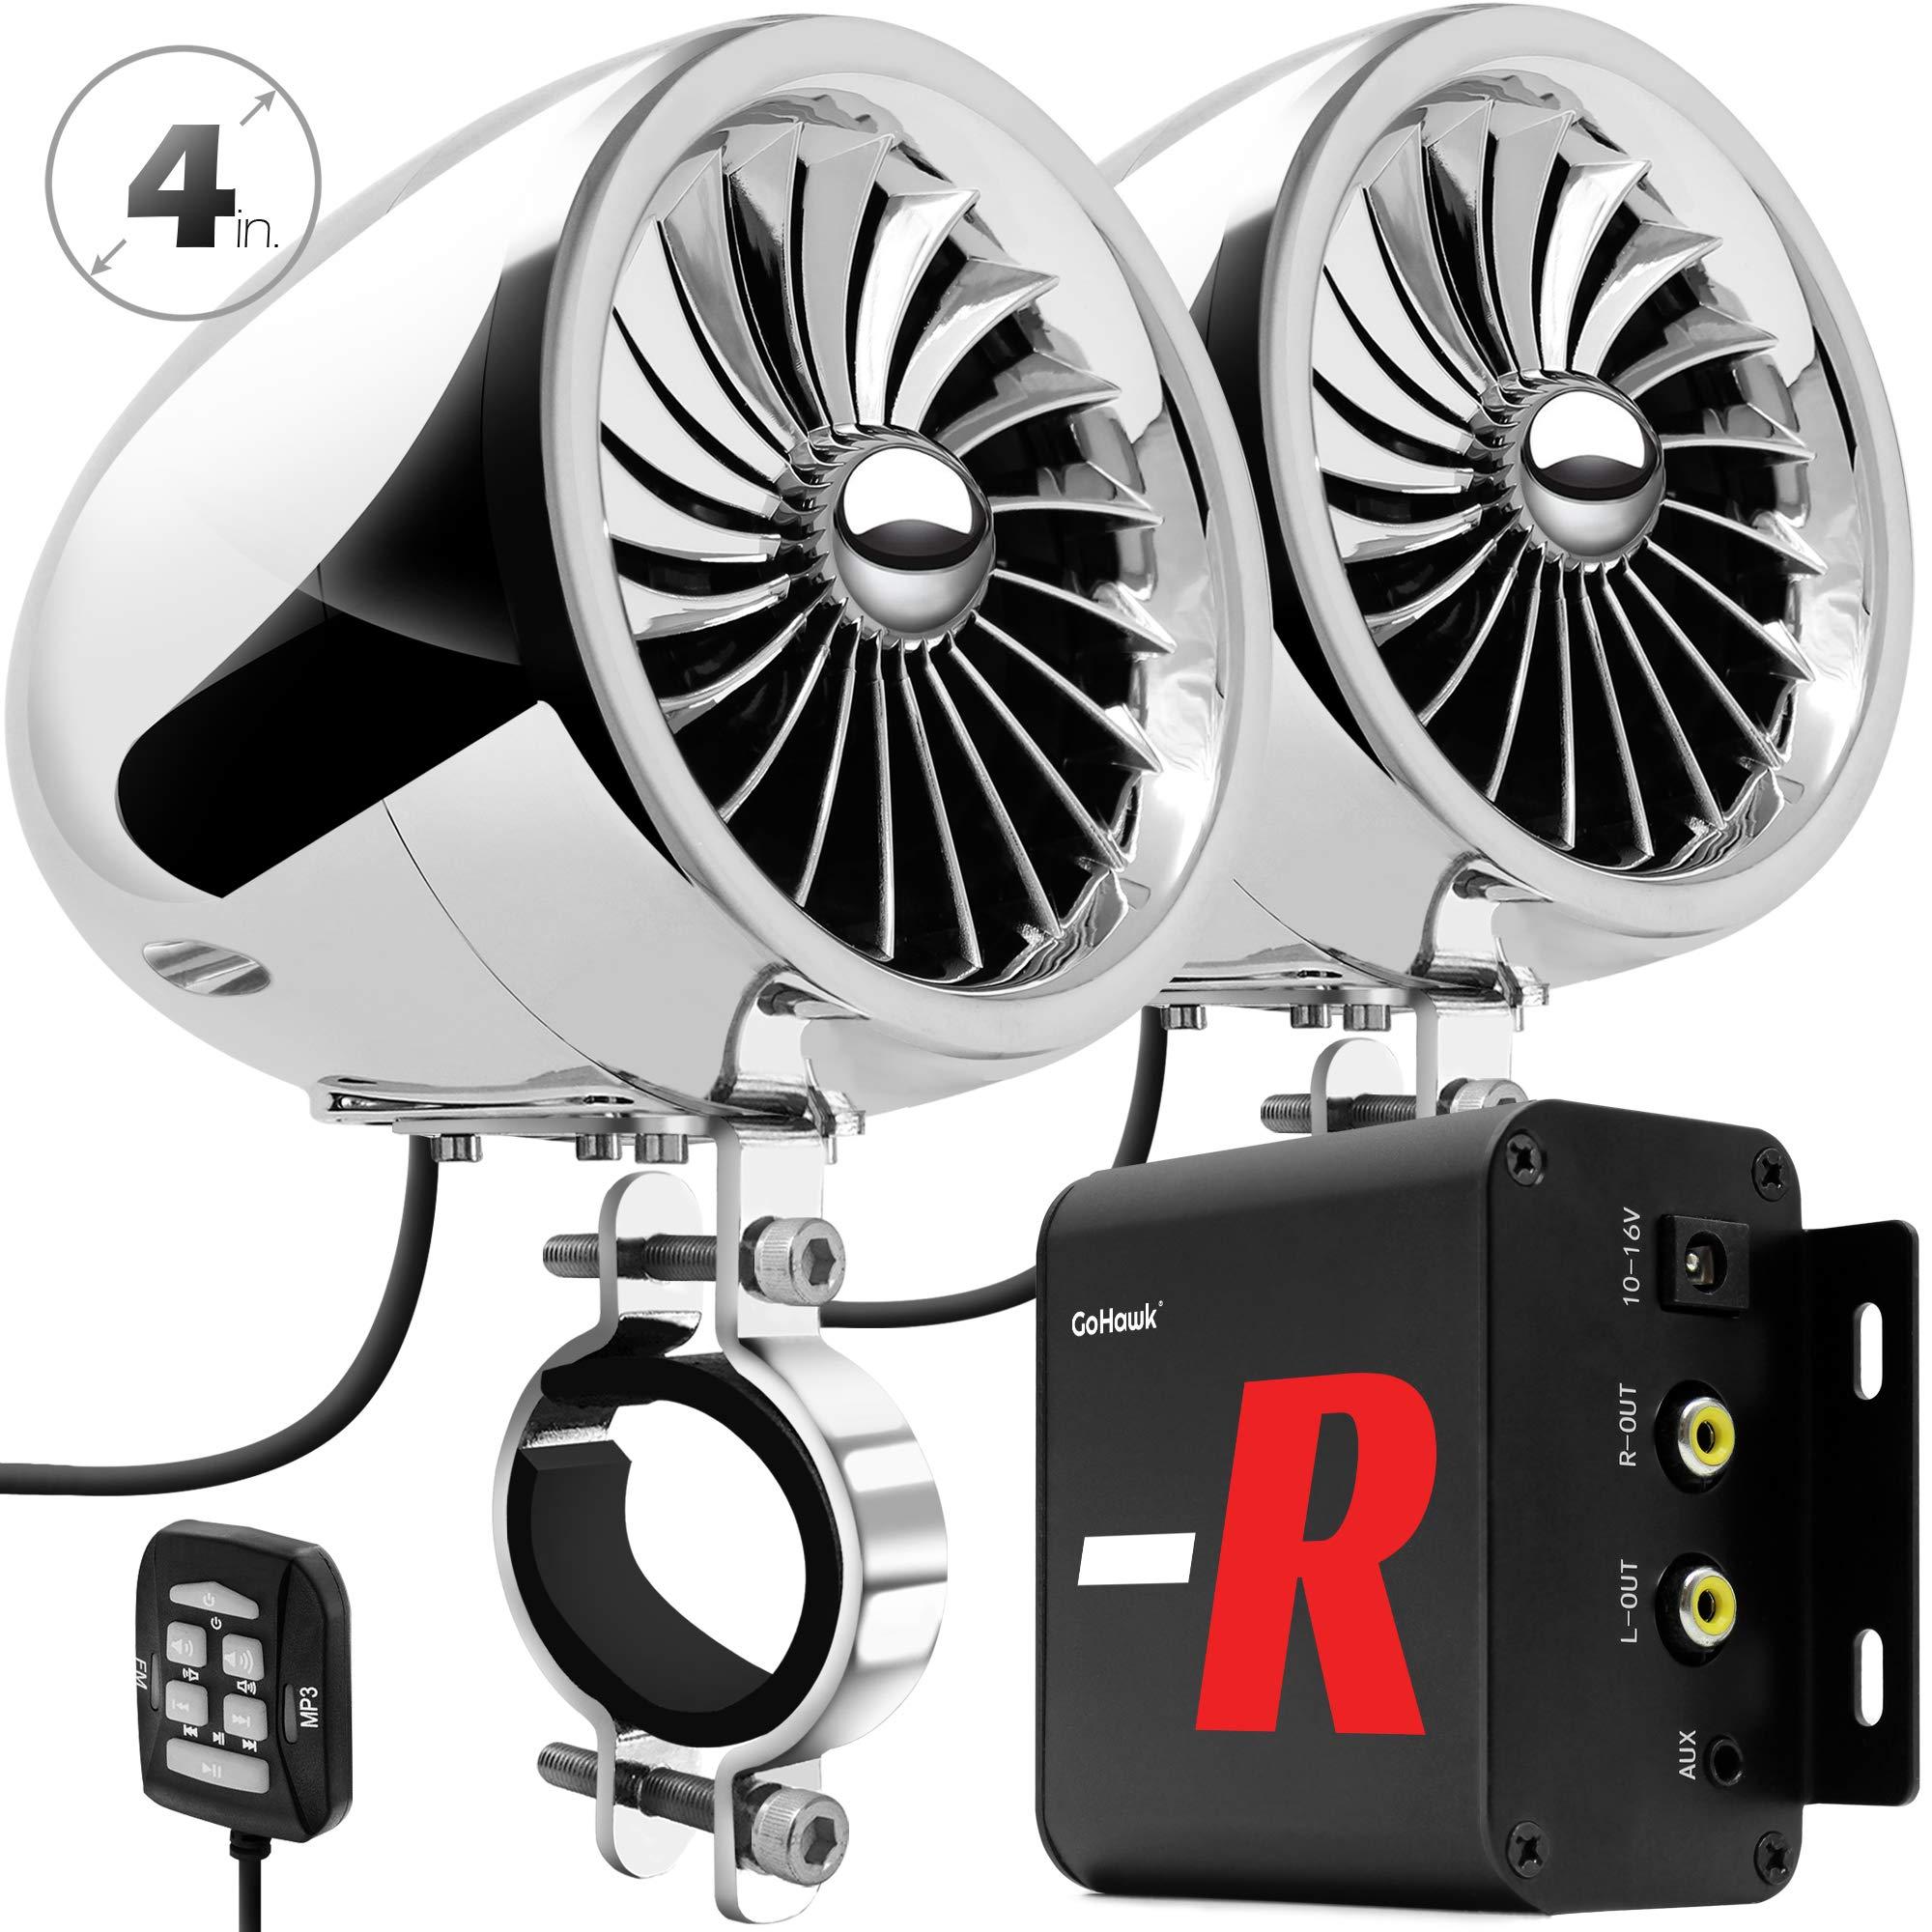 GoHawk TJ4-R Amplifier 4'' Full Range Waterproof Bluetooth Motorcycle Stereo Speakers 1 to 1.5 in. Handlebar Mount Audio Amp System Harley Touring Cruiser ATV UTV RZR, AUX, FM Radio